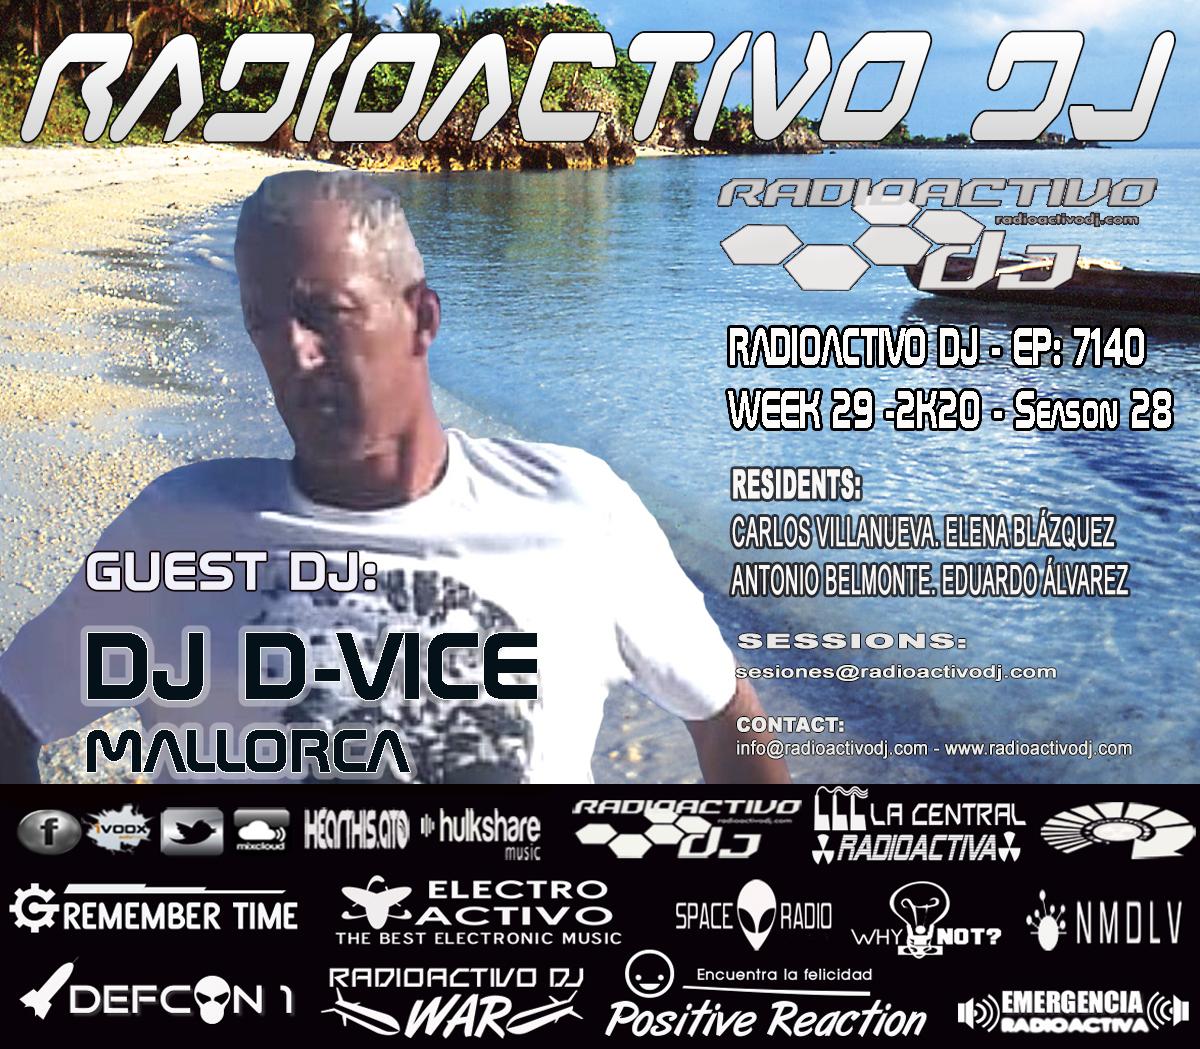 RADIOACTIVO-DJ-29-2020